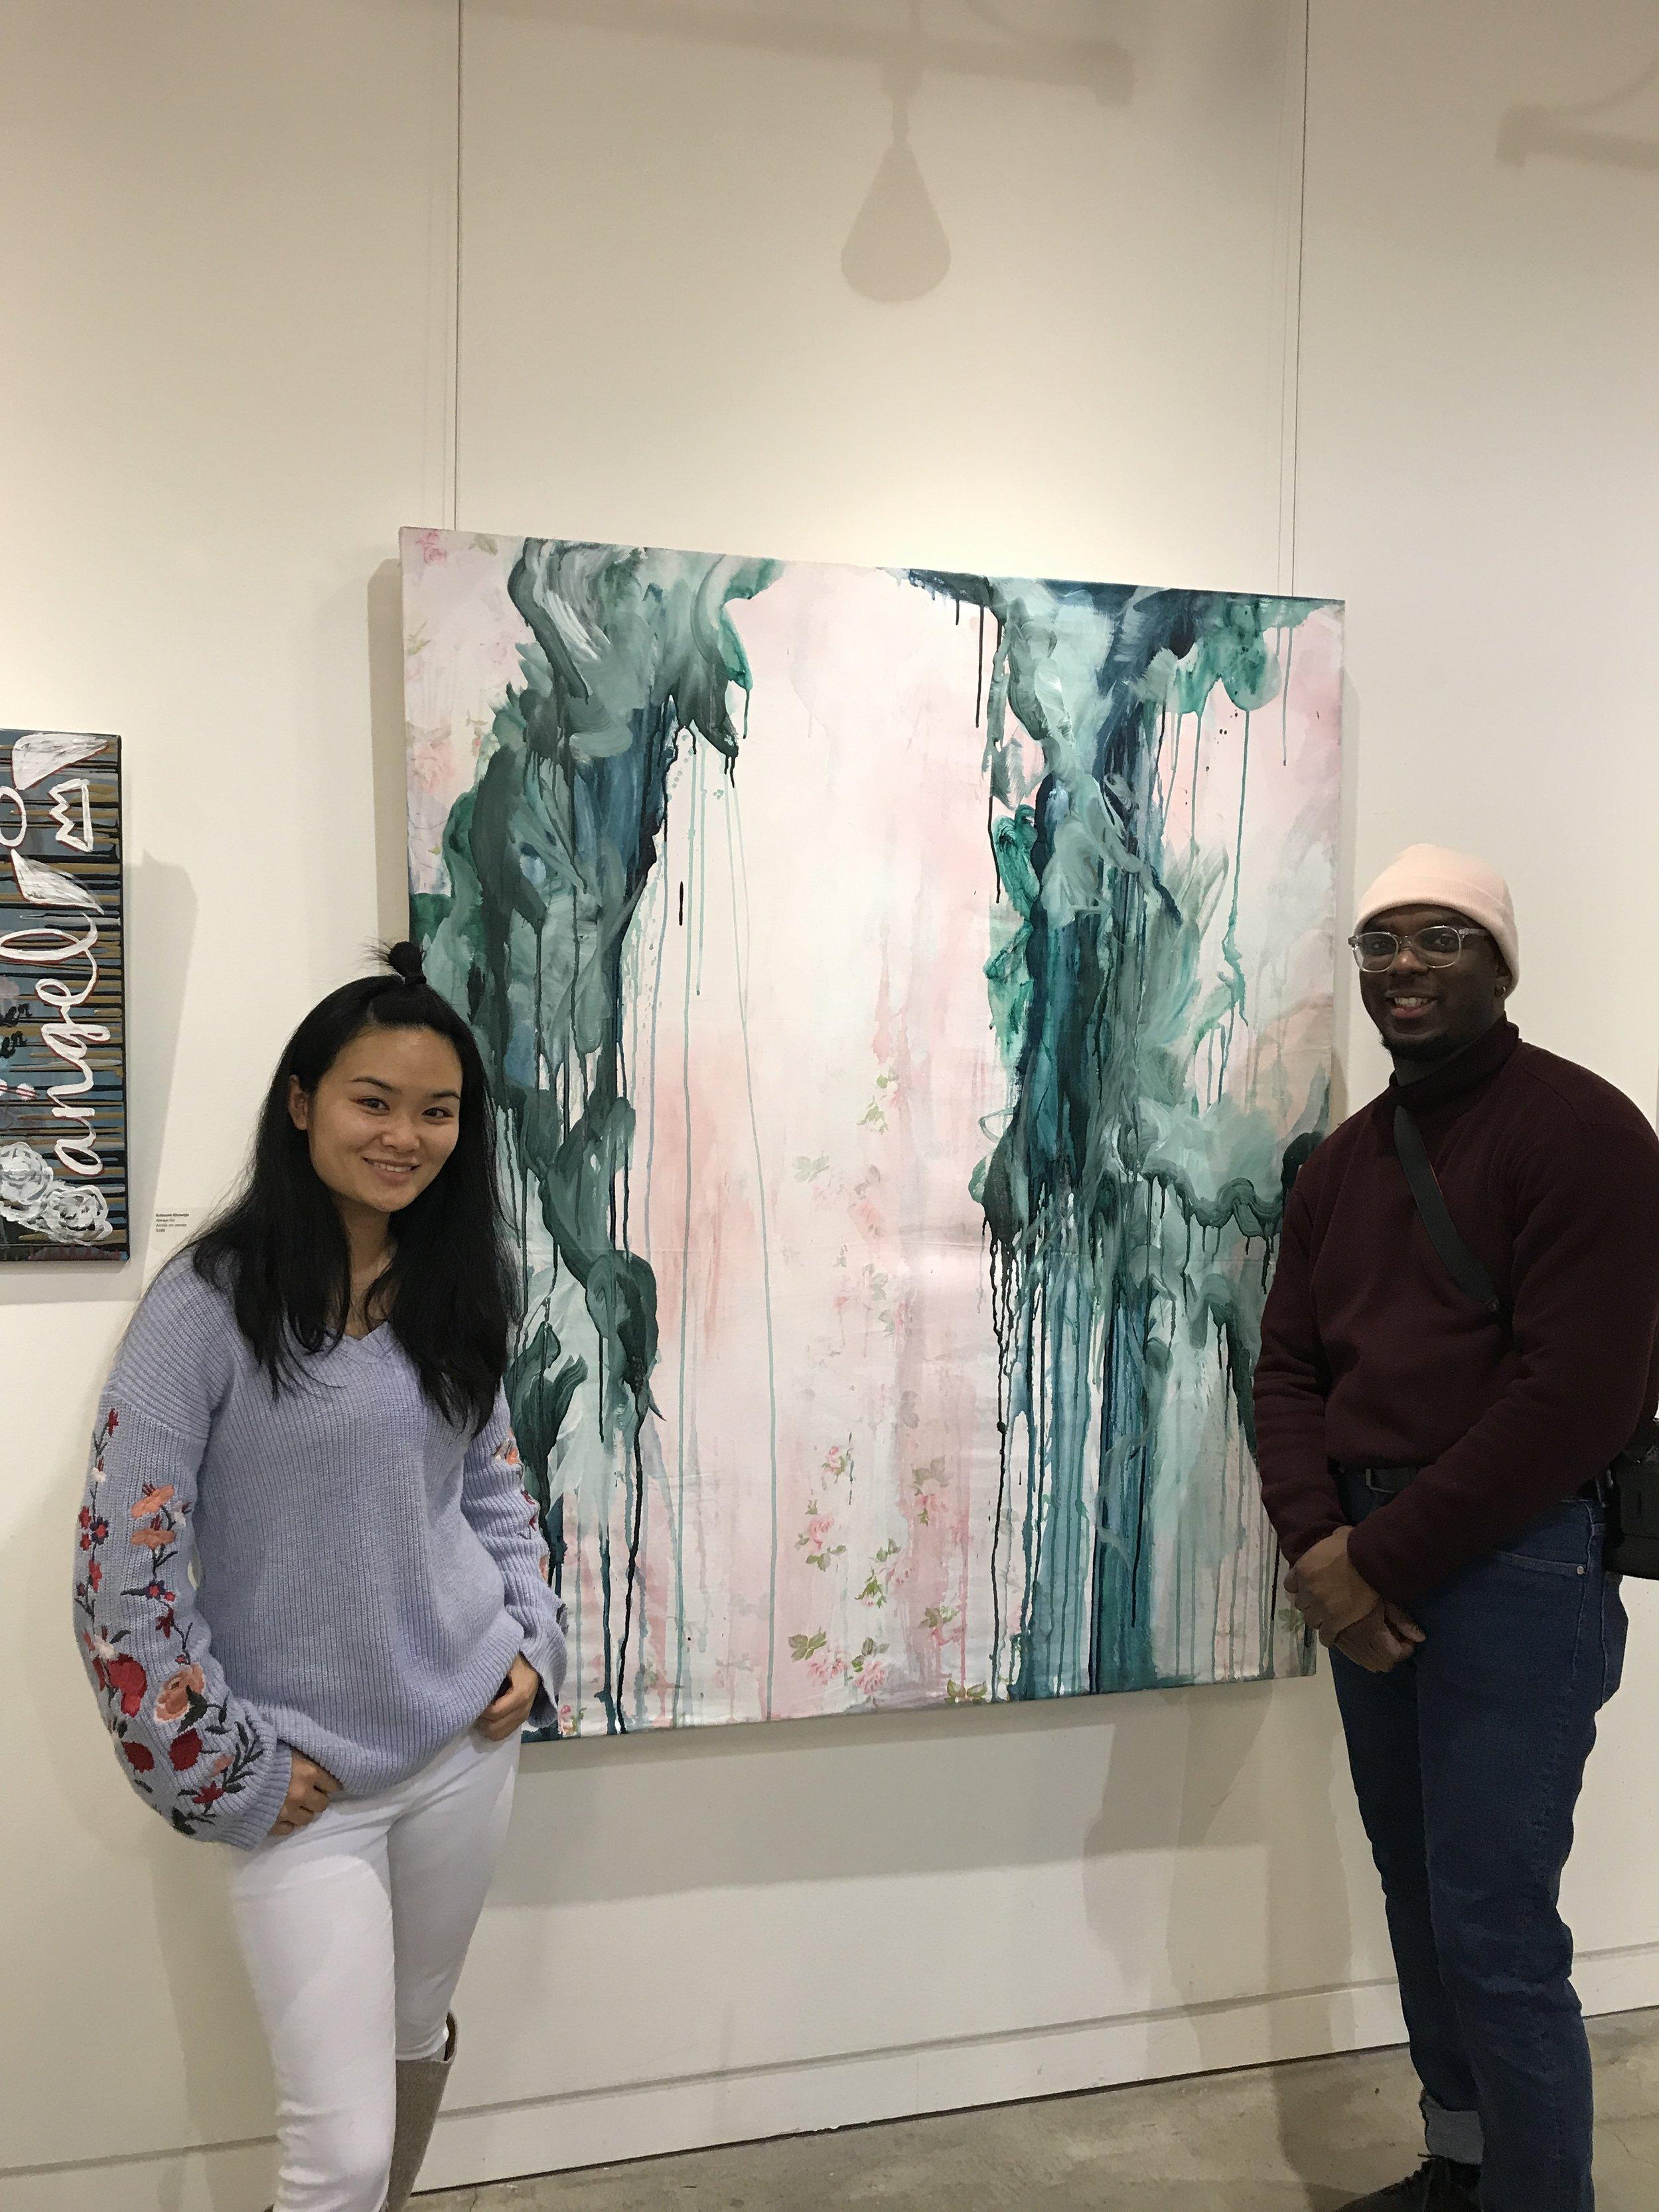 Jacqueline Mak and Johneil Harris in front of La Machine de Reve. No 1 by artist Bella Vita.